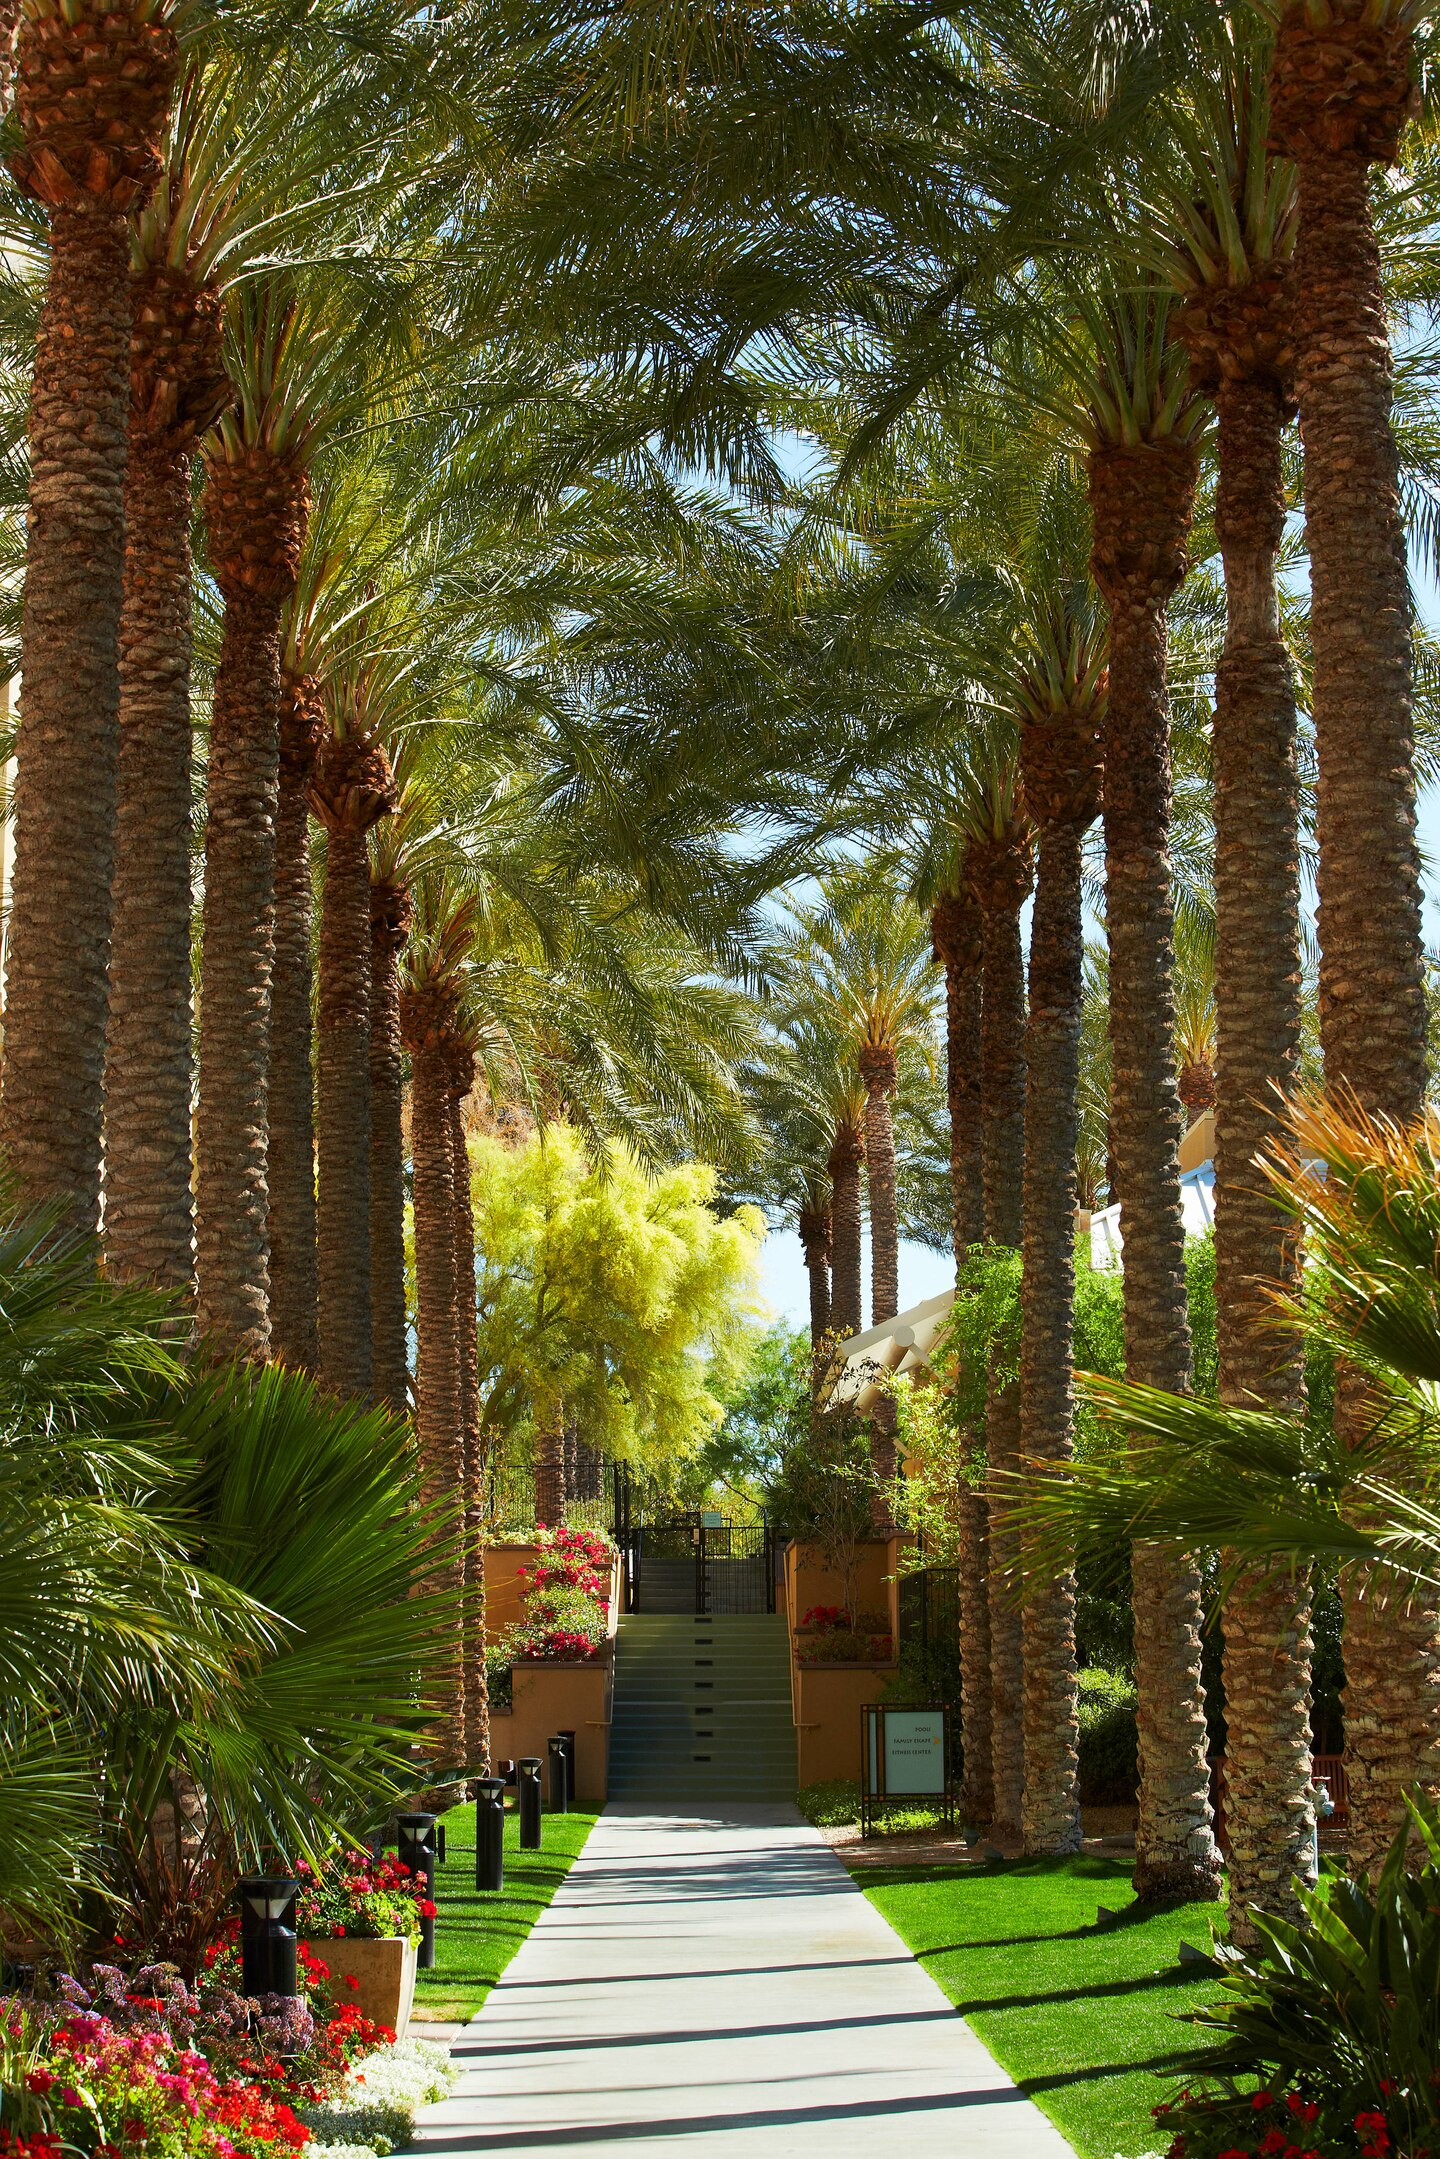 path through phoenix resort with palm trees